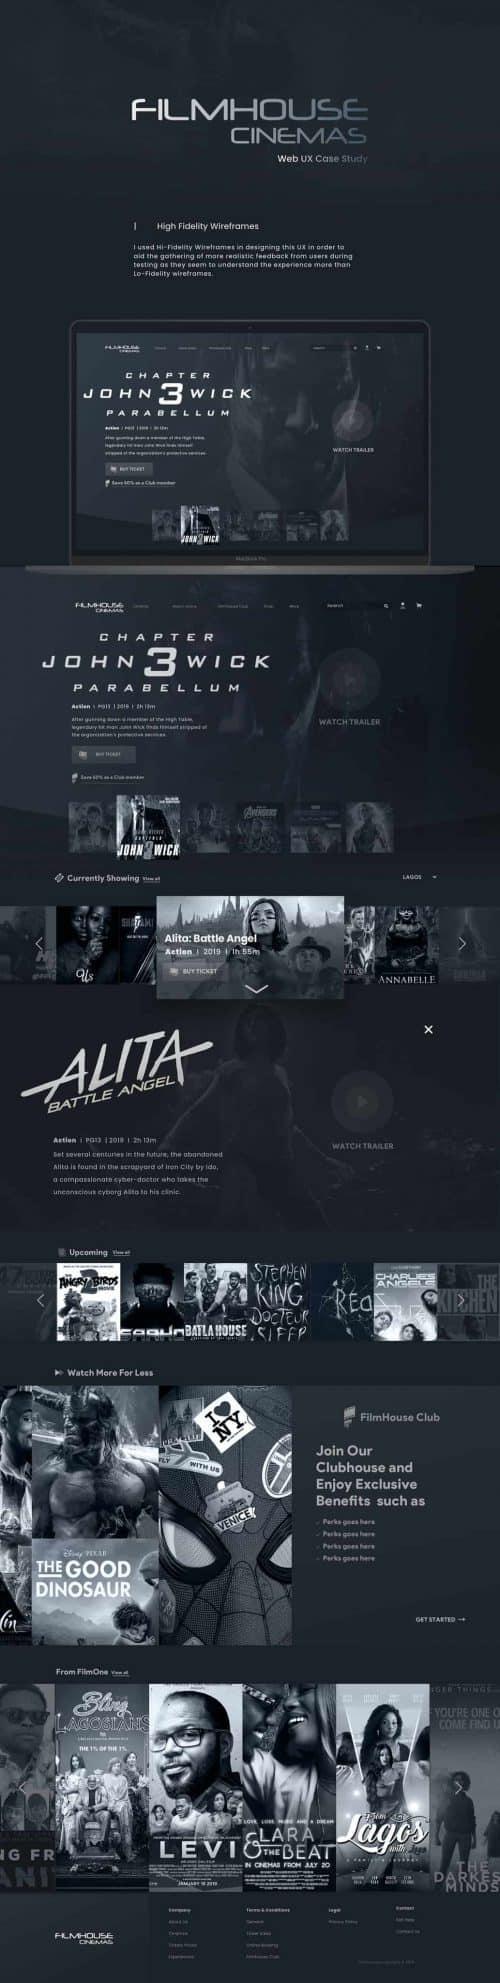 Filmhouse Interactive Web Design UI UX